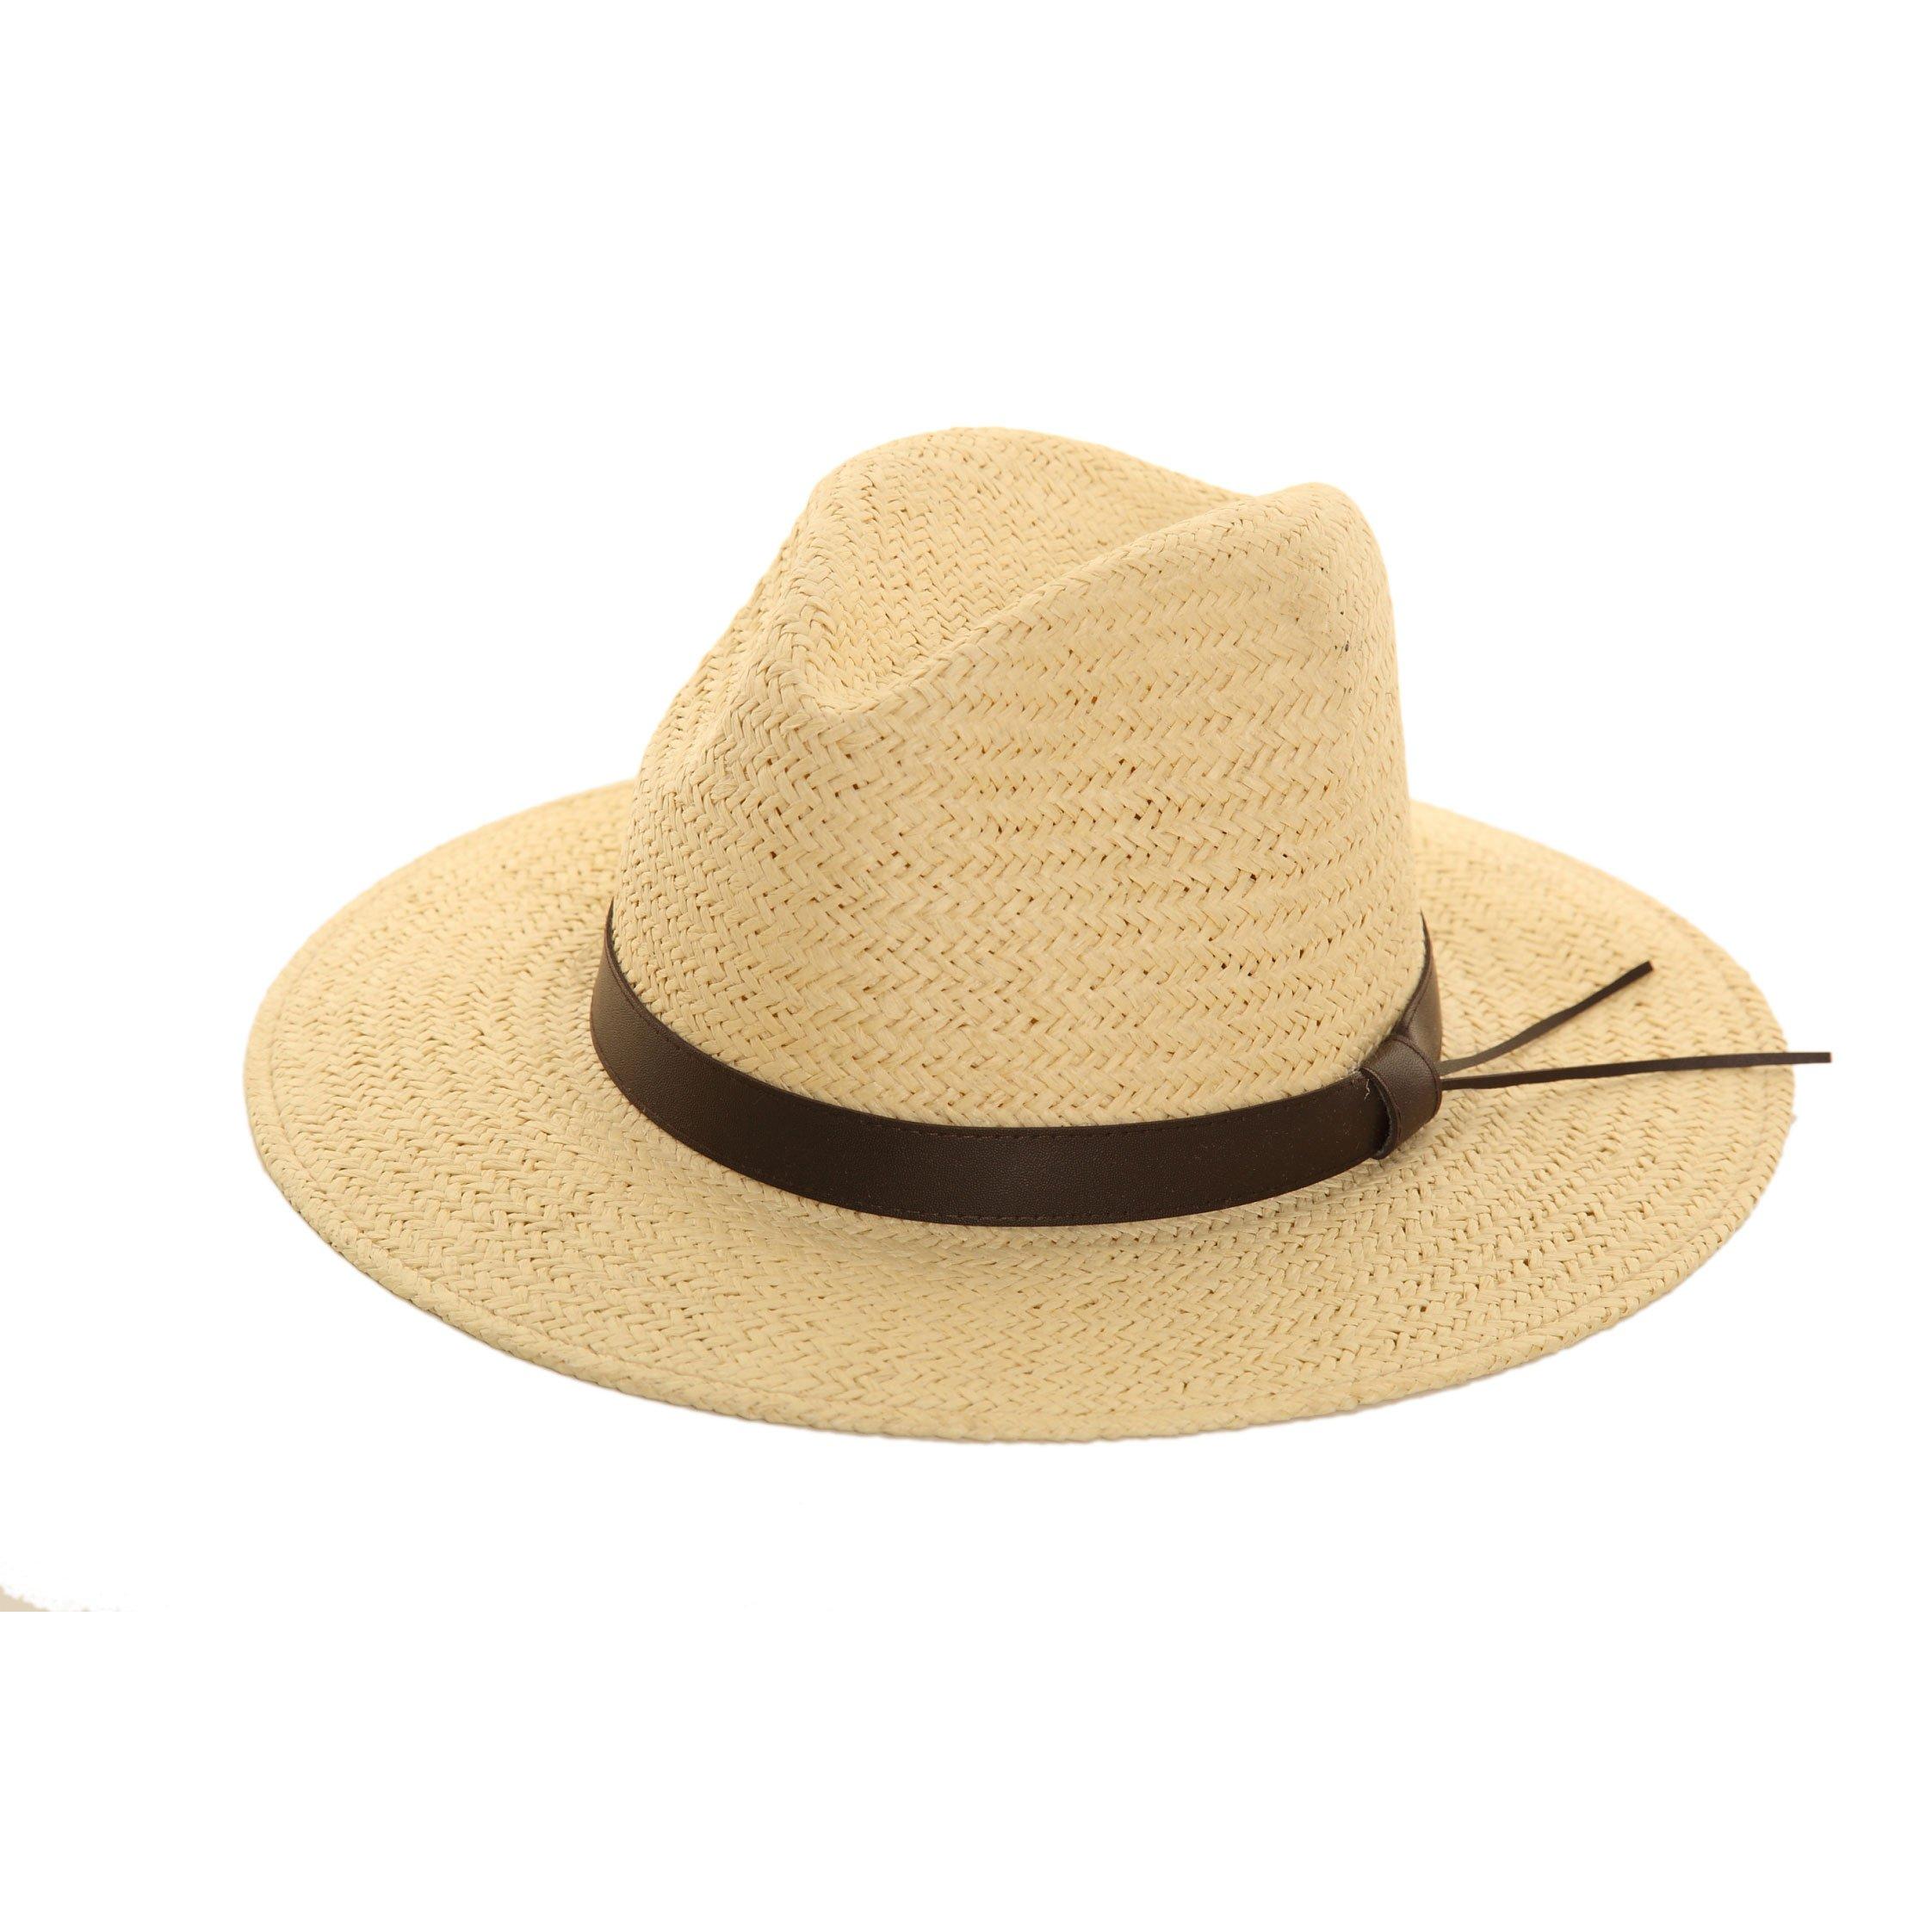 Mens Straw Fedora Ssp Hats